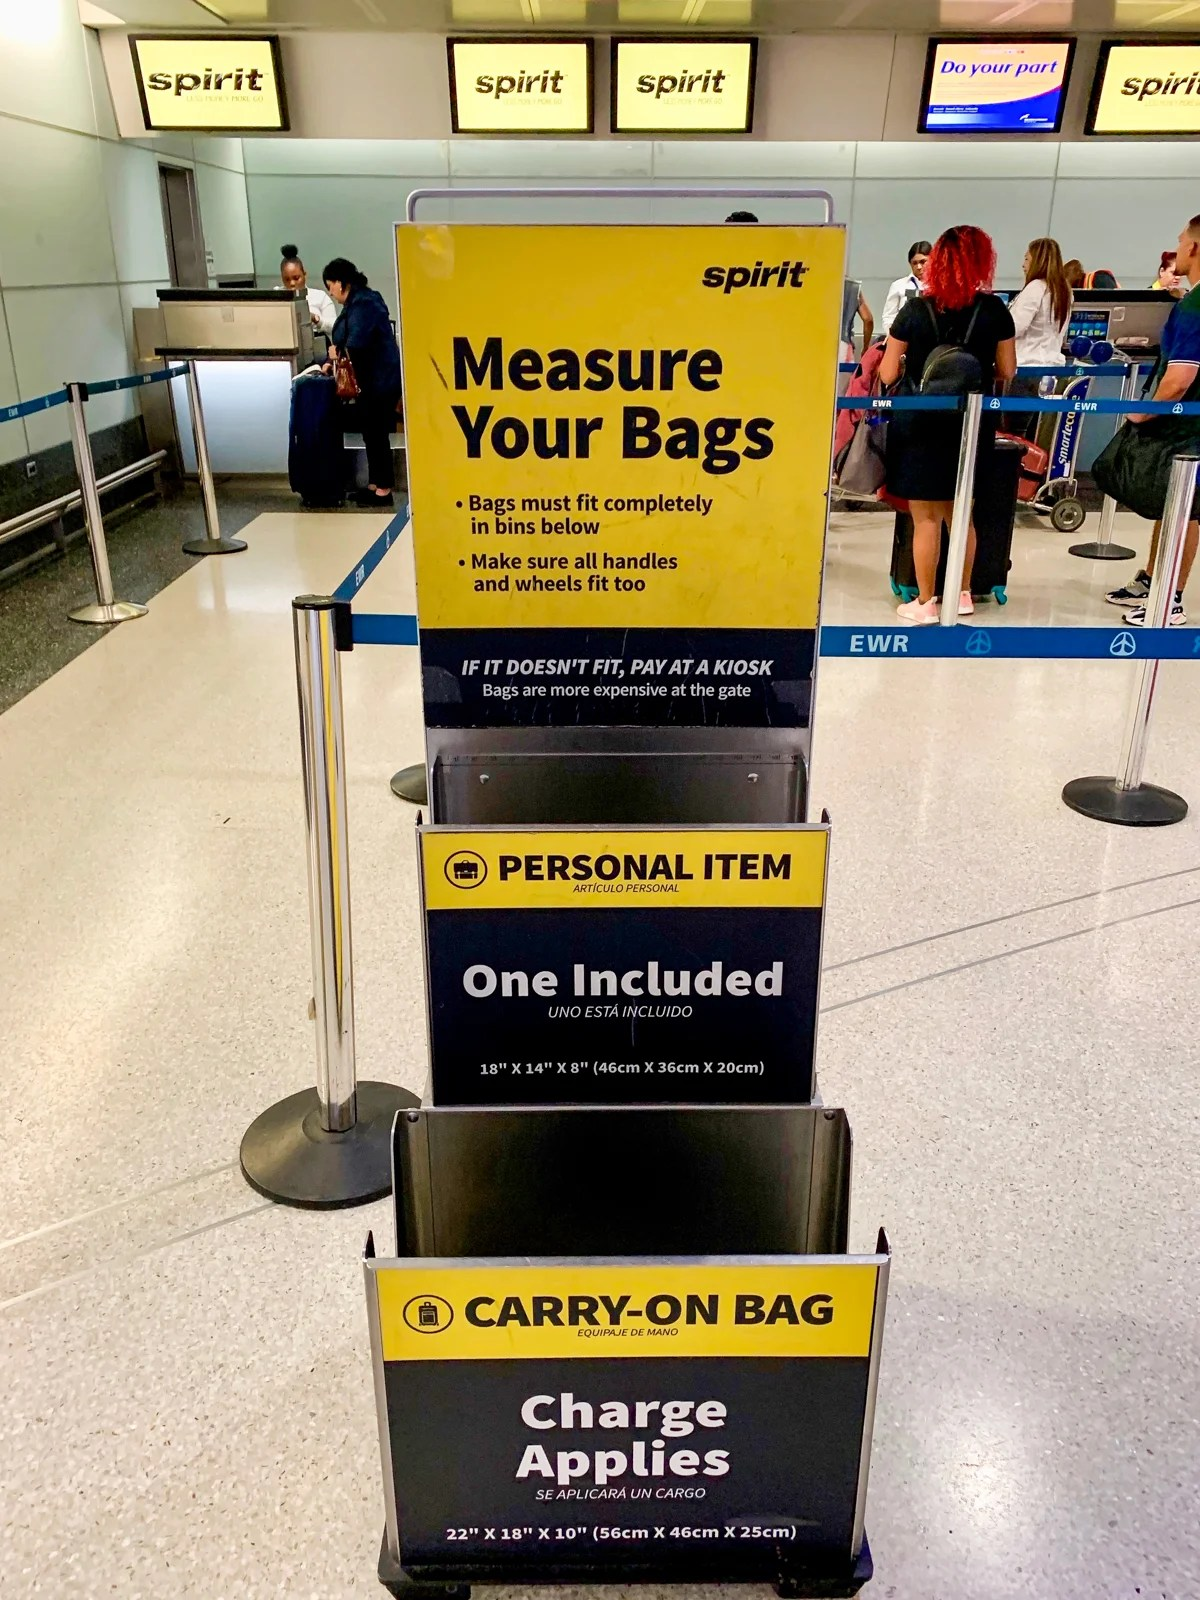 spirit airline baggage coupons